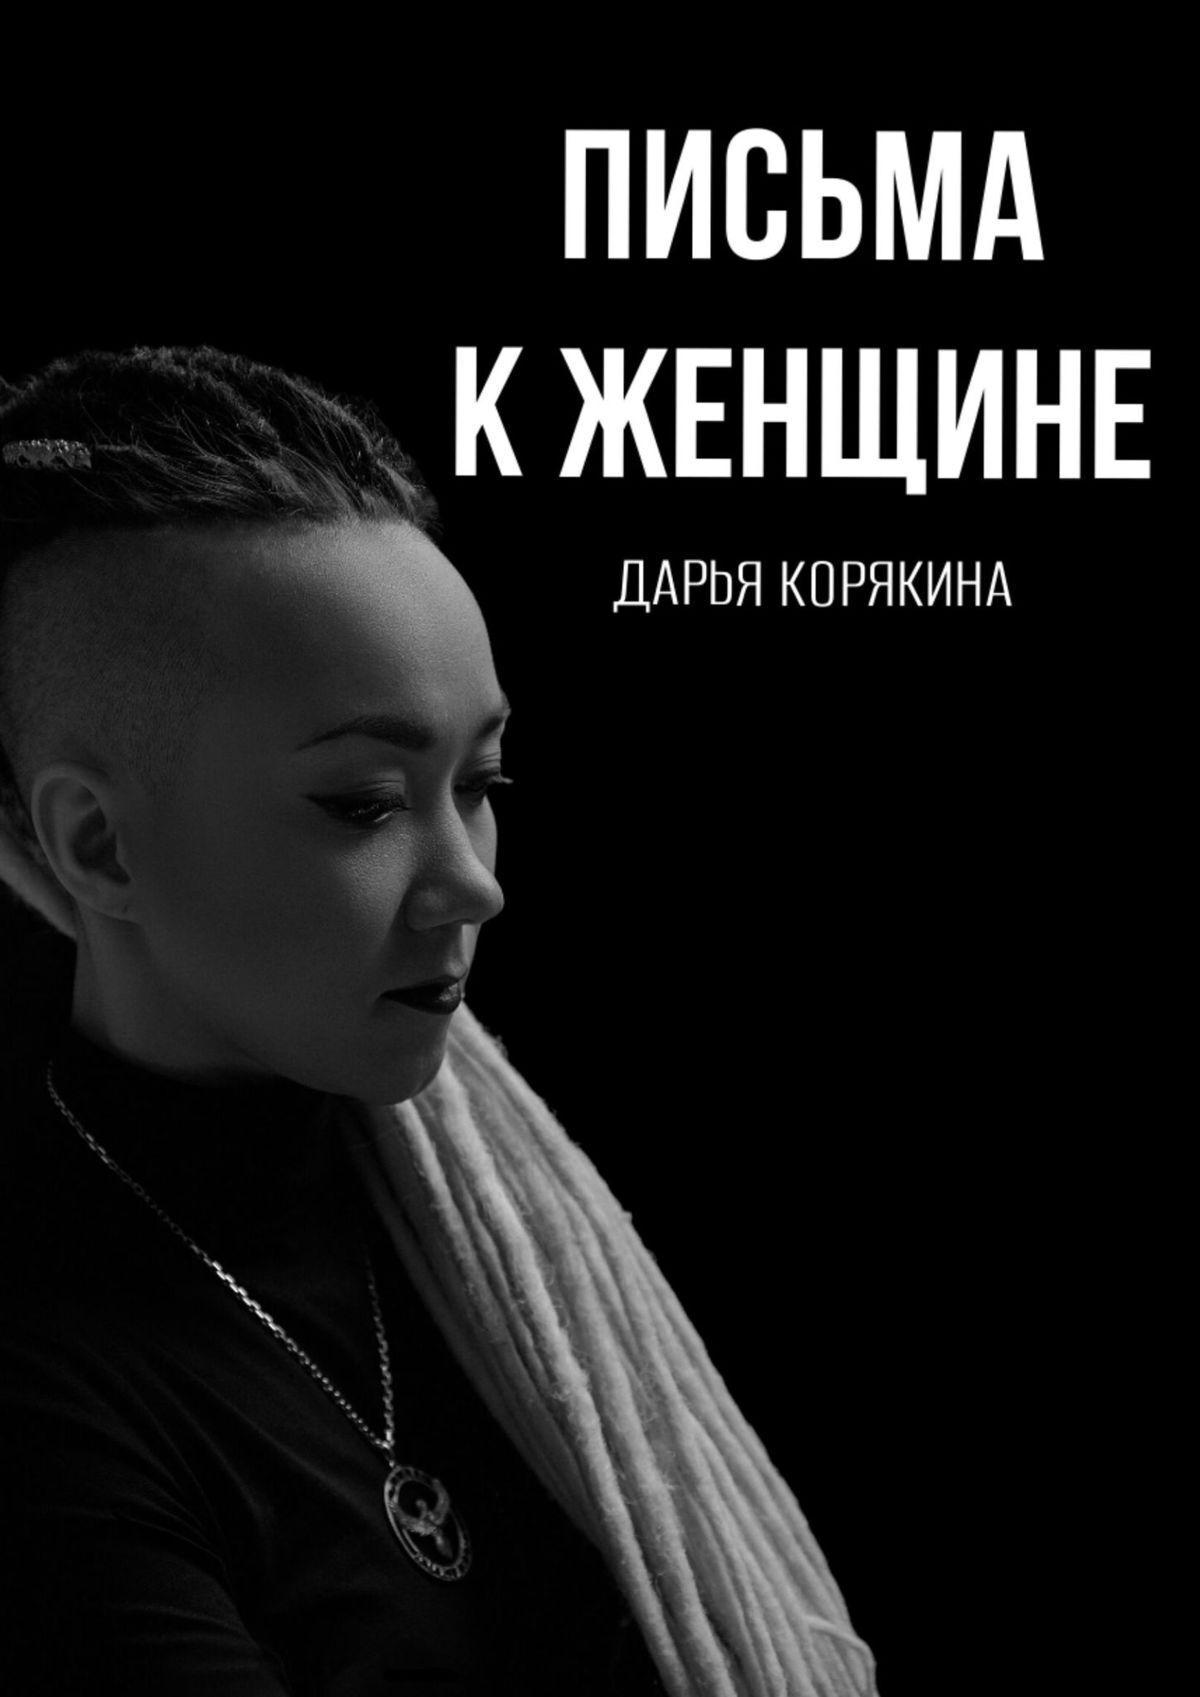 цена на Дарья Корякина Письма кженщине